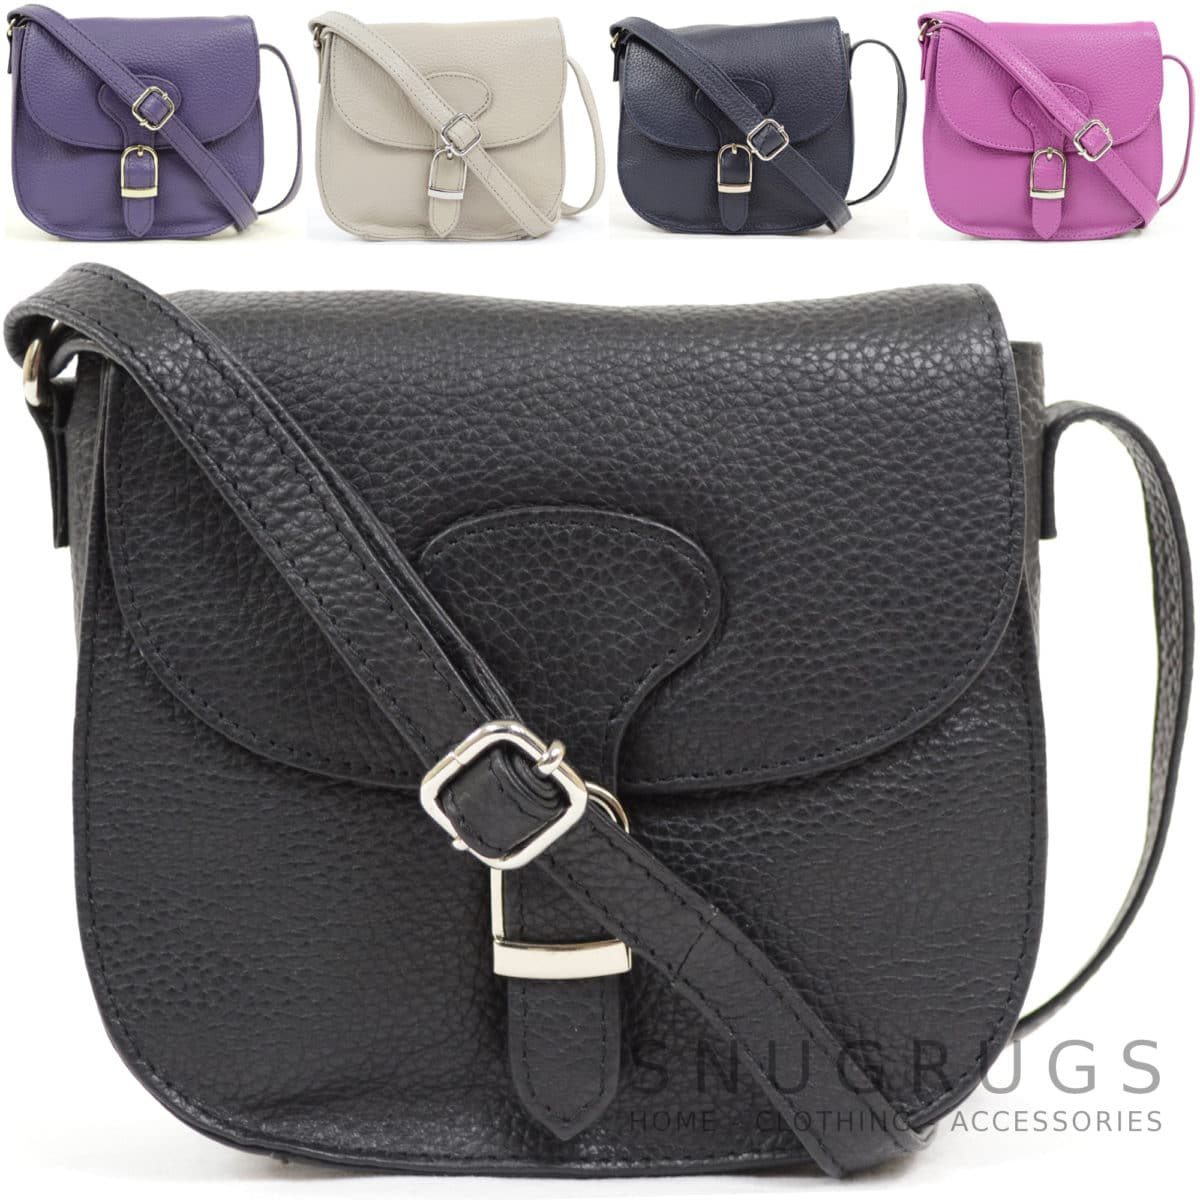 Fiona – Leather Cross Body / Shoulder Bag